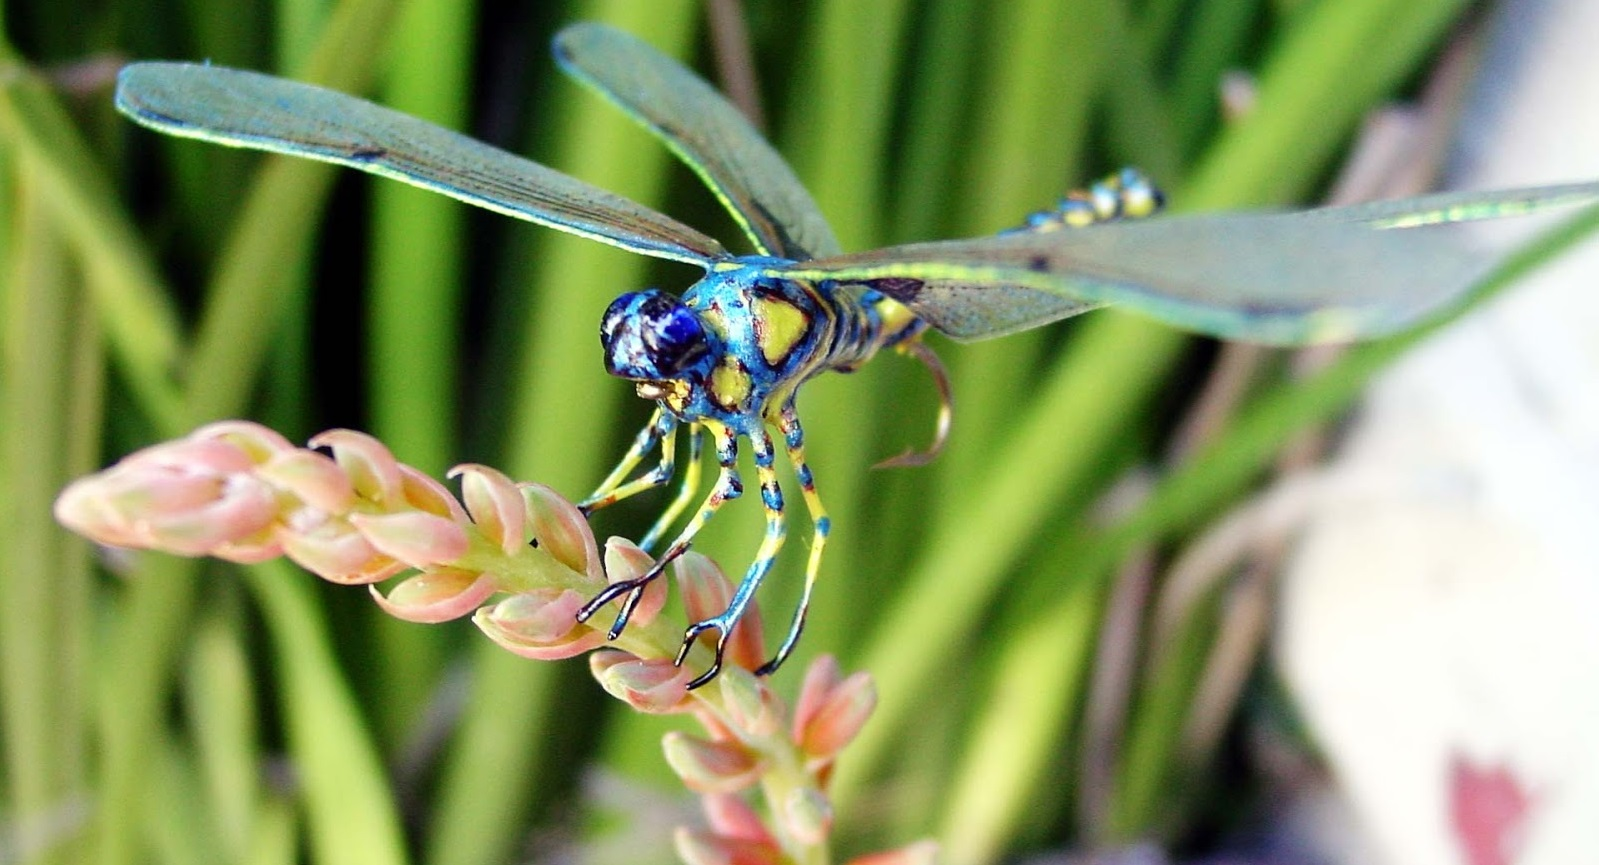 Chuồn chuồn xanh ôm bông